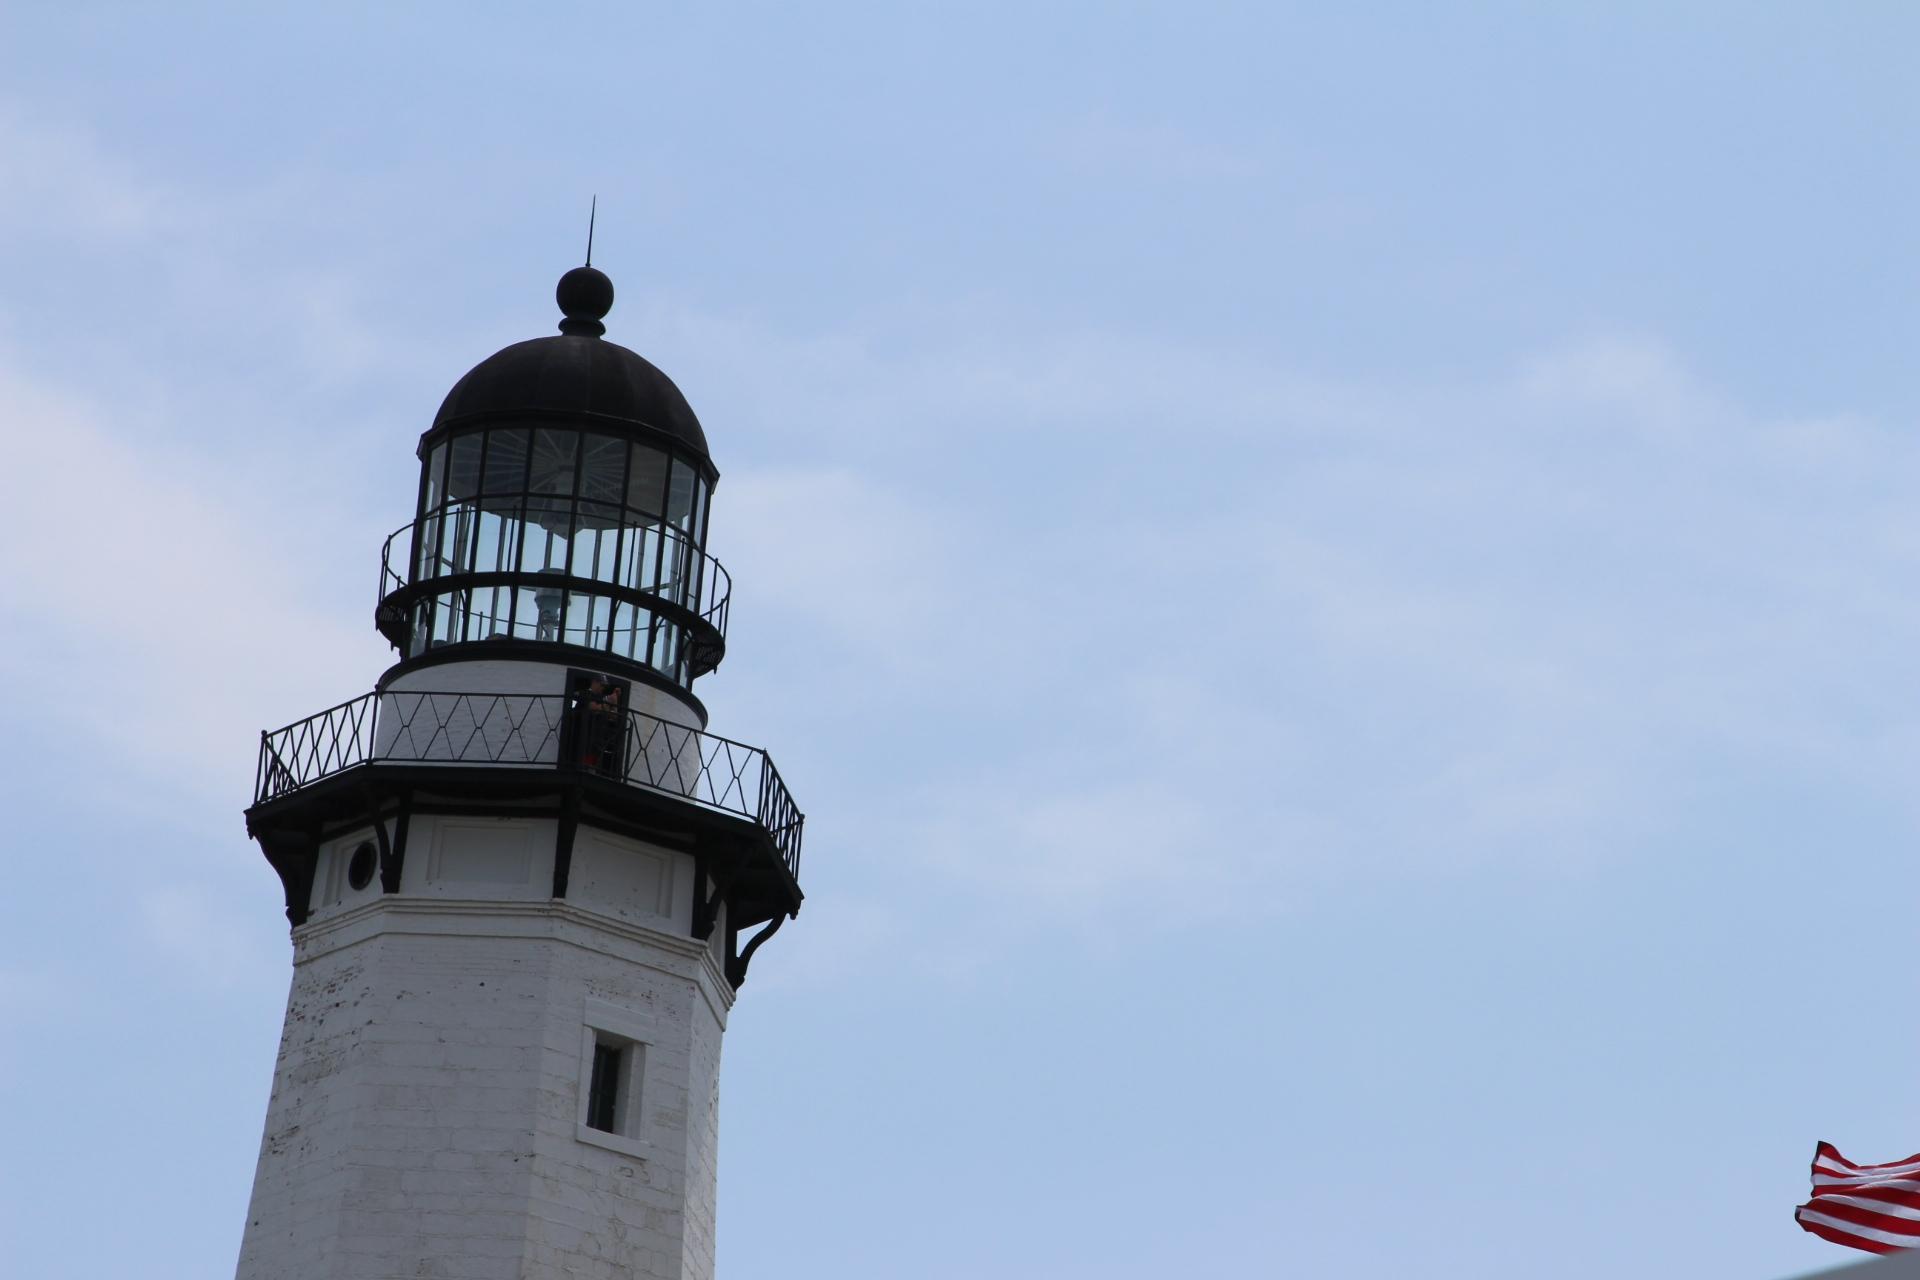 Lighthouse_light_3